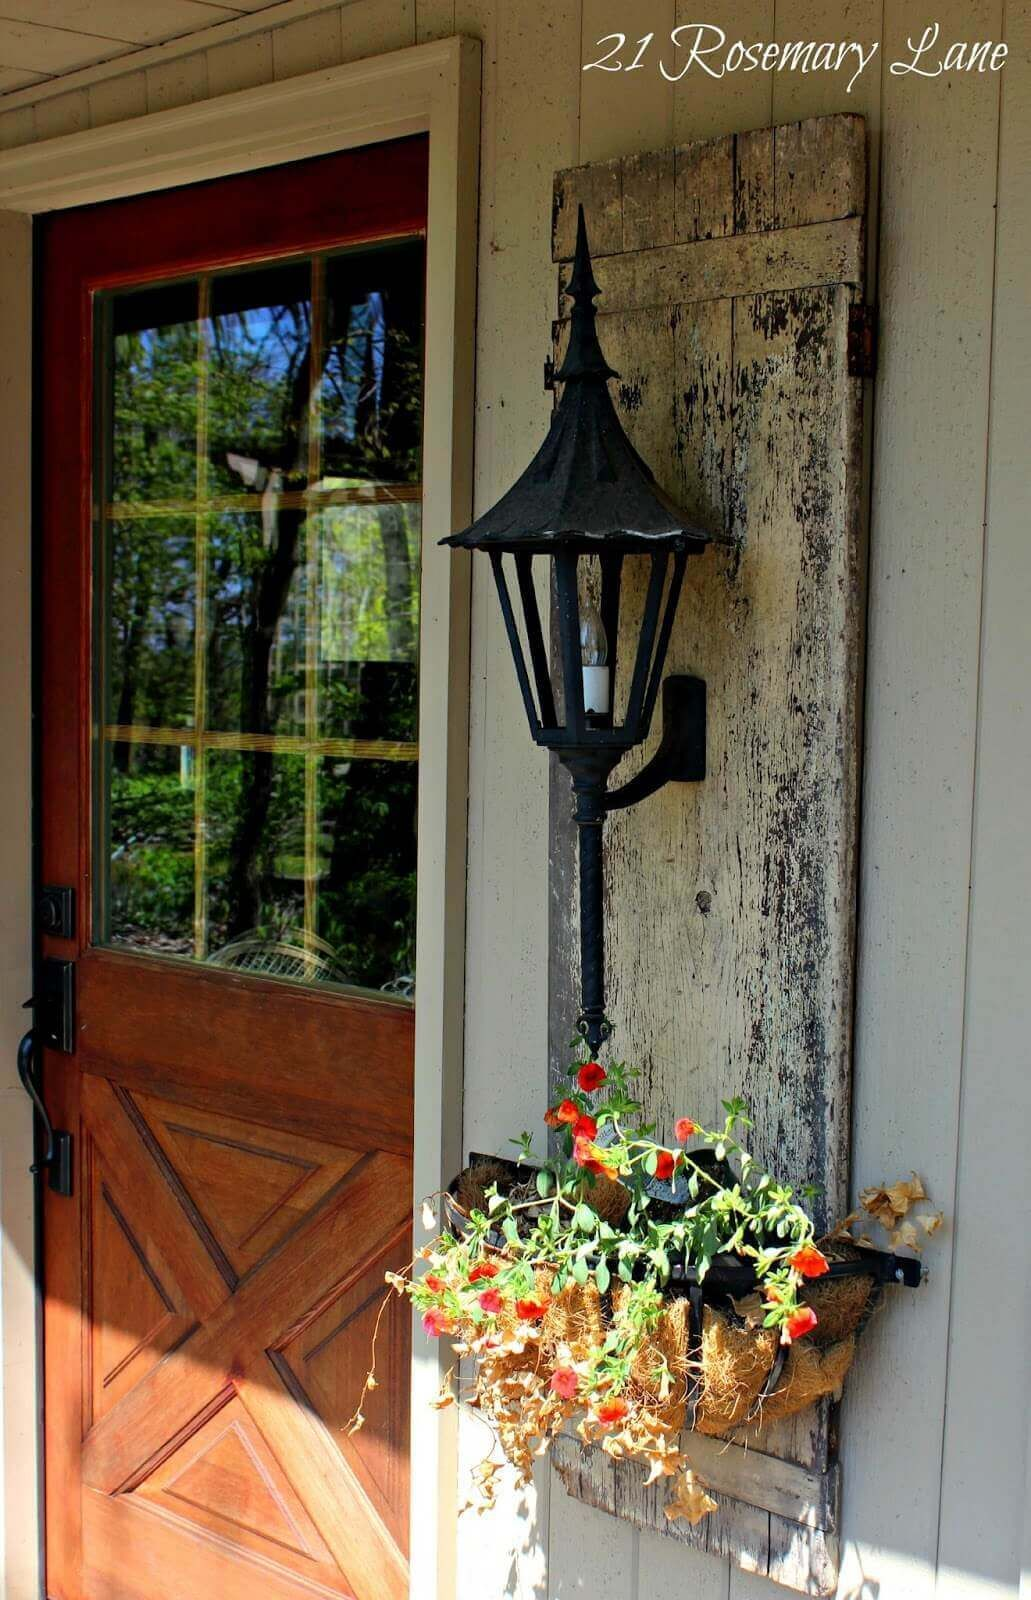 41 Farmhouse Porch Decorating Ideas To Show Off This Season Harp Post Farmhouse Outdoor Decor Porch Wall Decor Front Porch Decorating